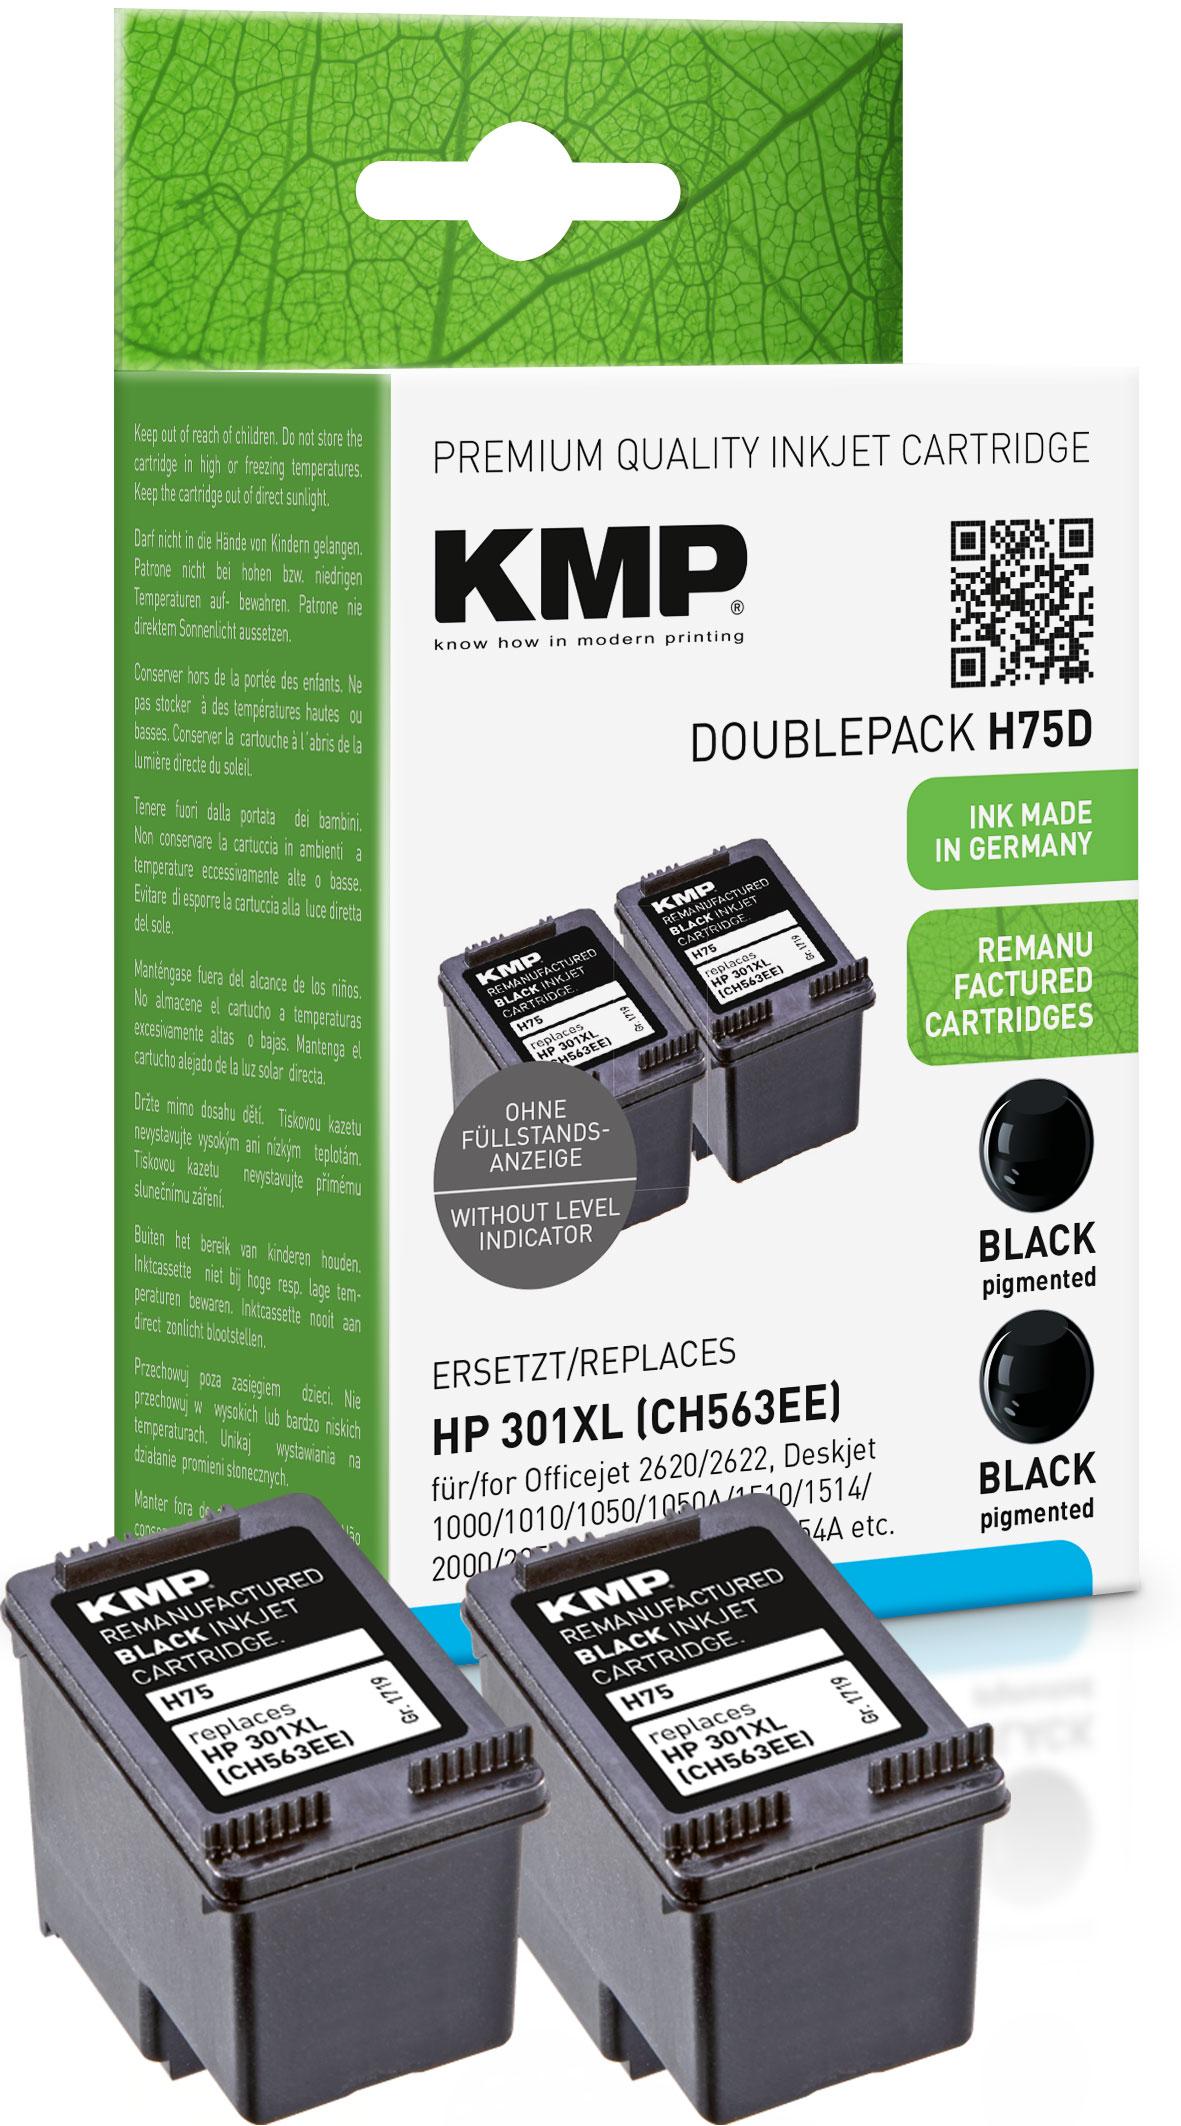 Tintenpatrone ersetzt HP 301XL (CH563EE)